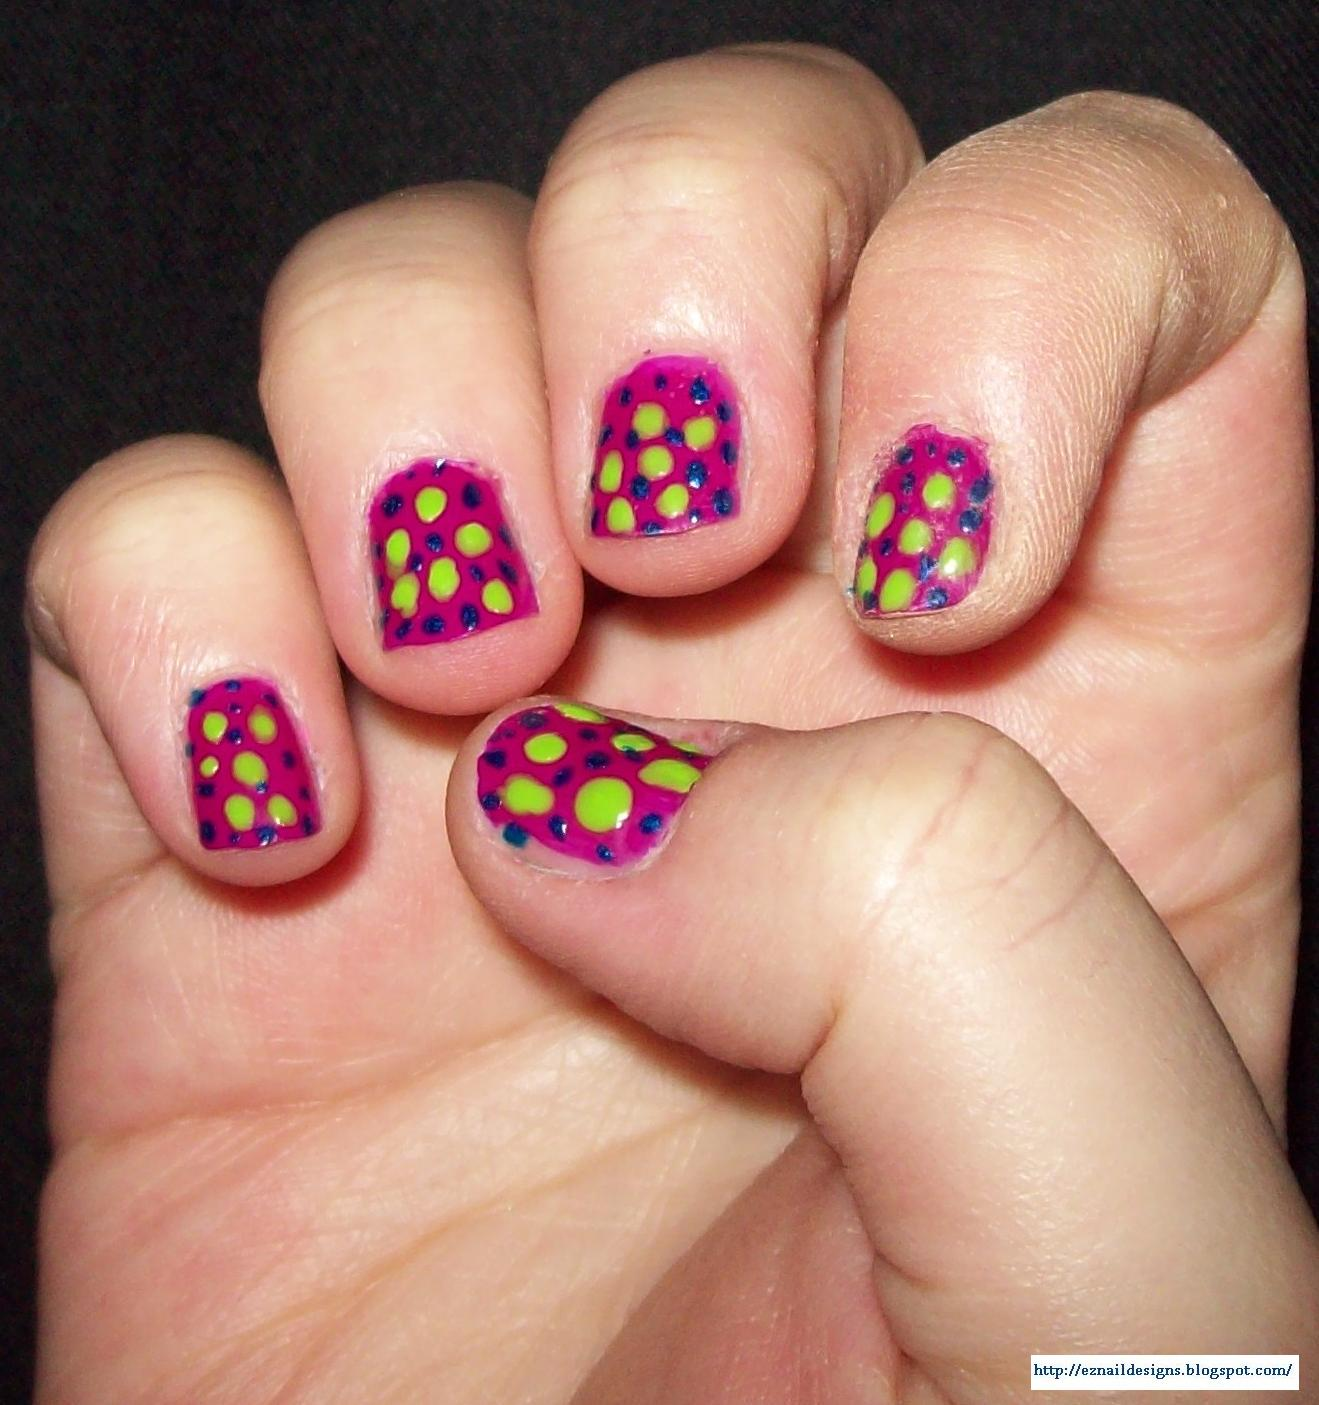 EZ Nail Designs: Polka Dot Nail Design